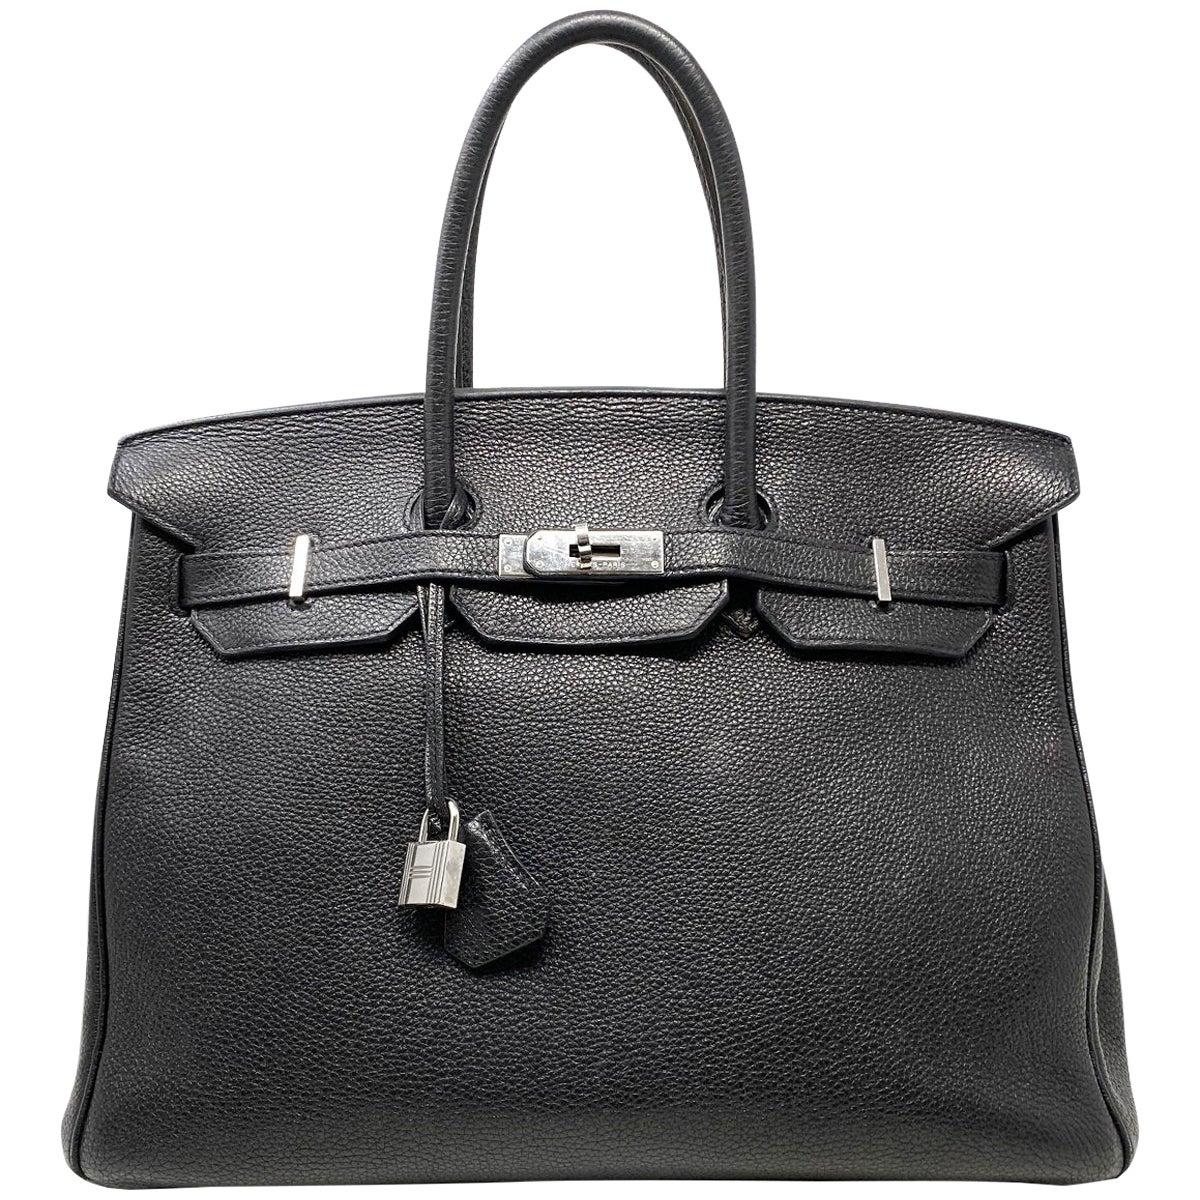 Hermes Birkin 35 Bag Togo Black Leather Palladium Hardware Top Handle Handbag